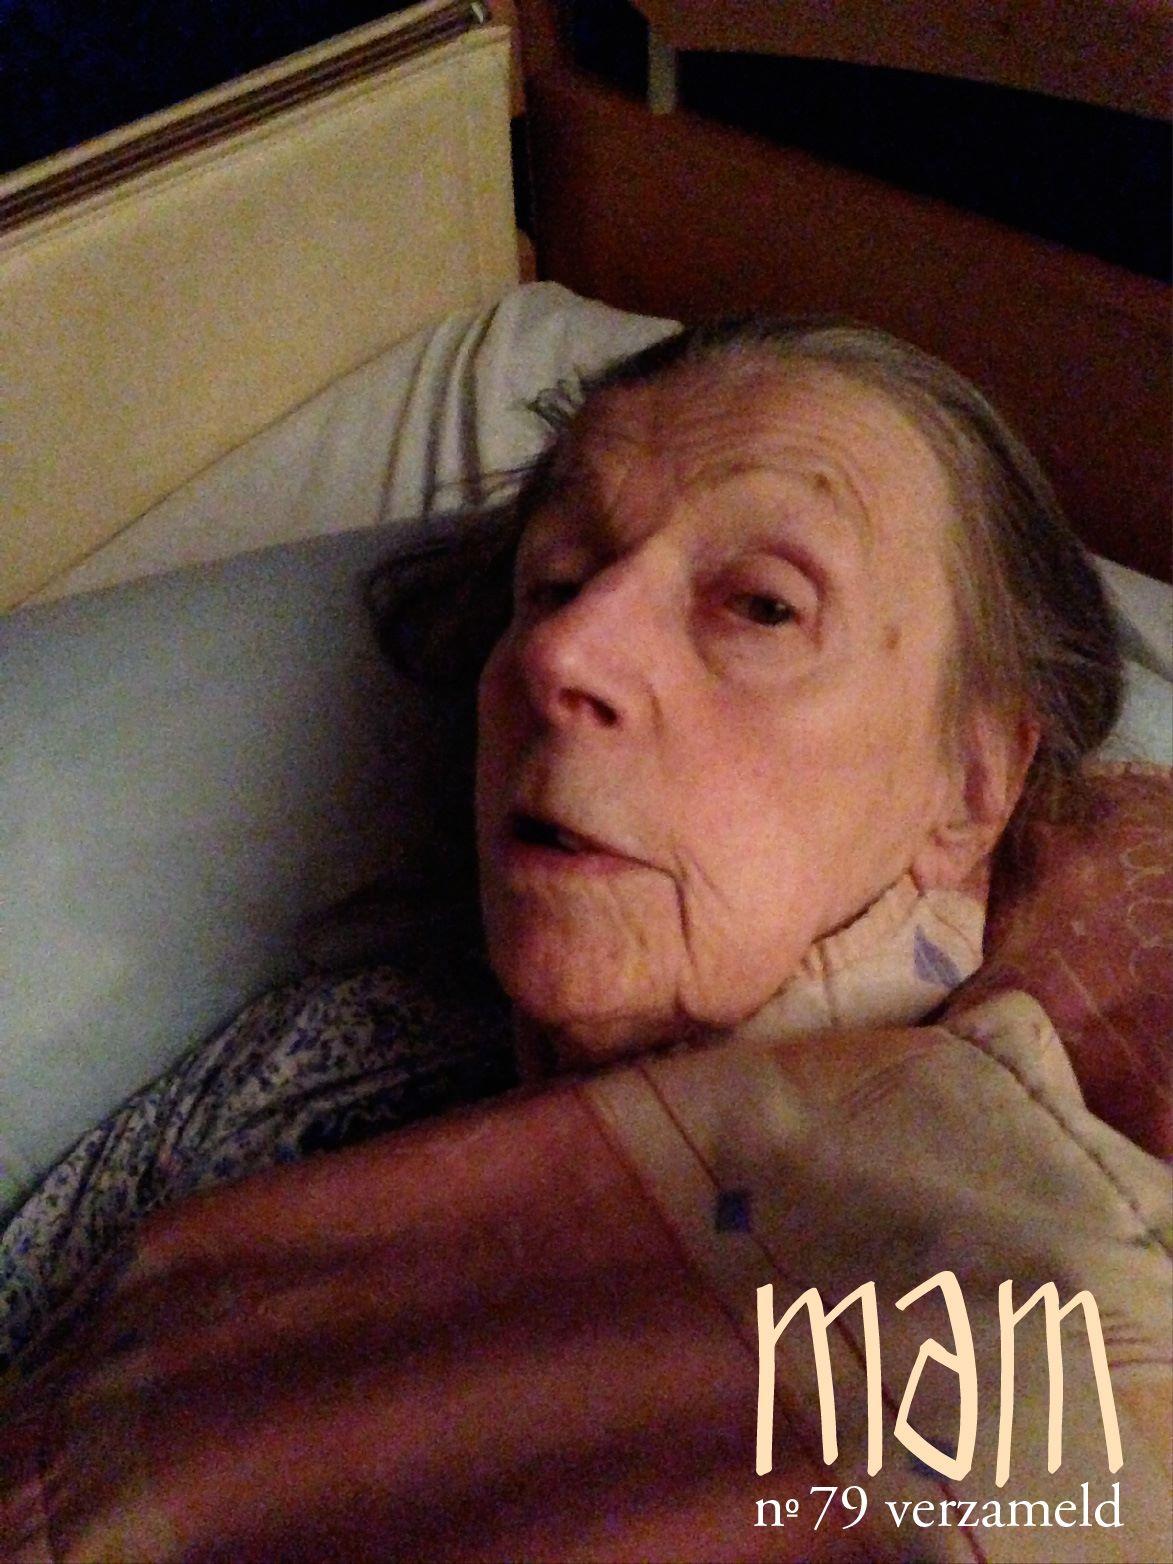 Jouw Naam #Mam #AdelheidRoosen #AlzheimerFluisteren